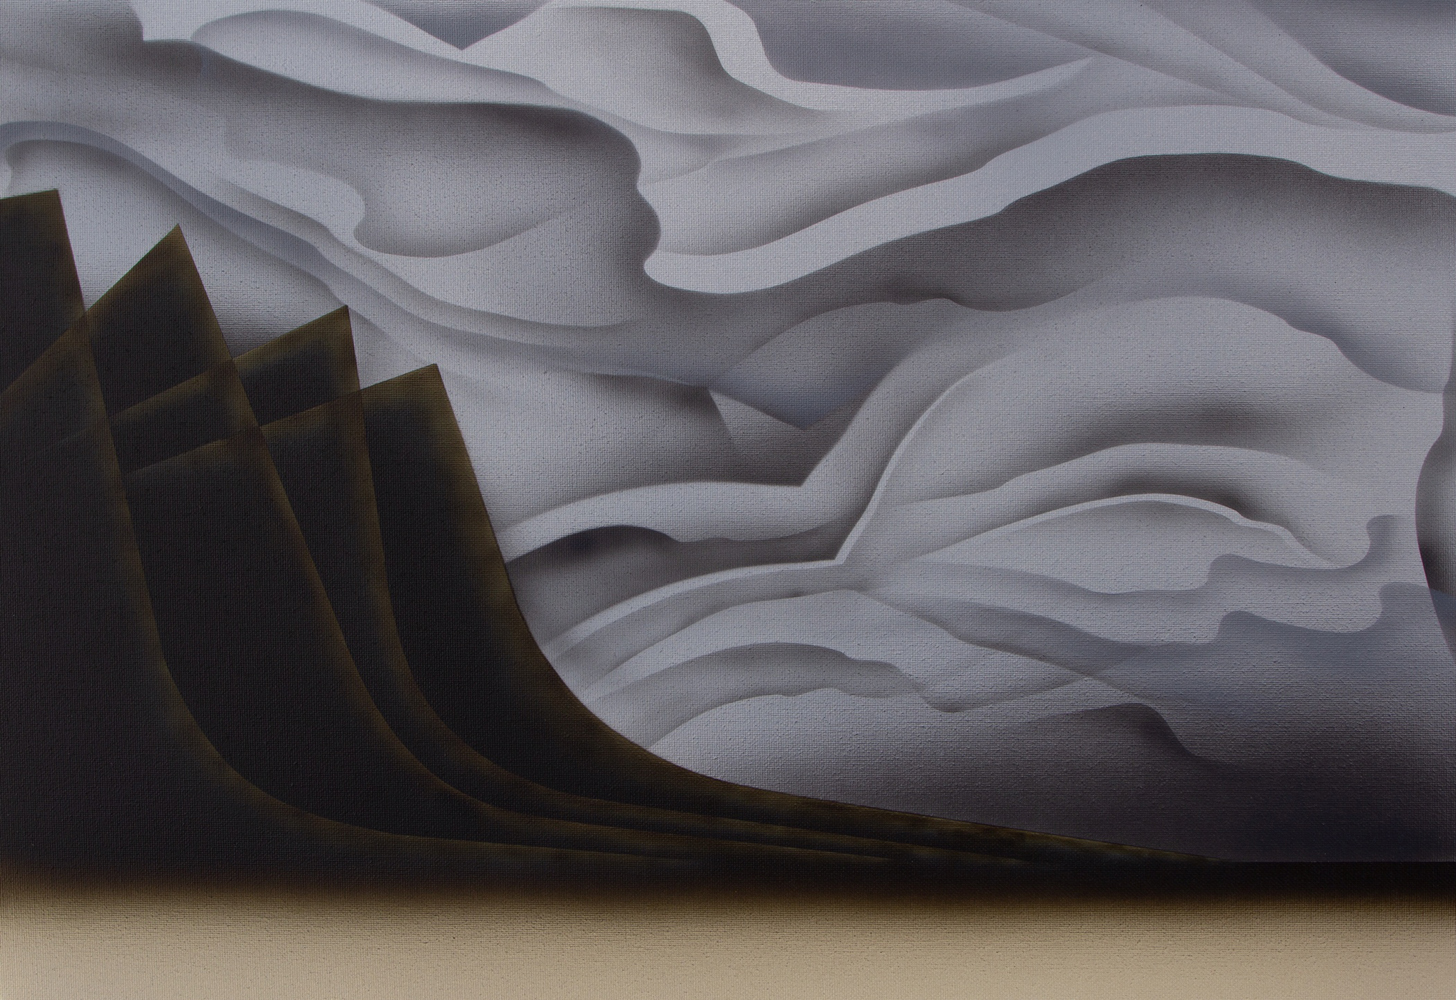 Matt Sellars, Alvord, 2021, acrylic on canvas, 16 x 23 inches, $2000.